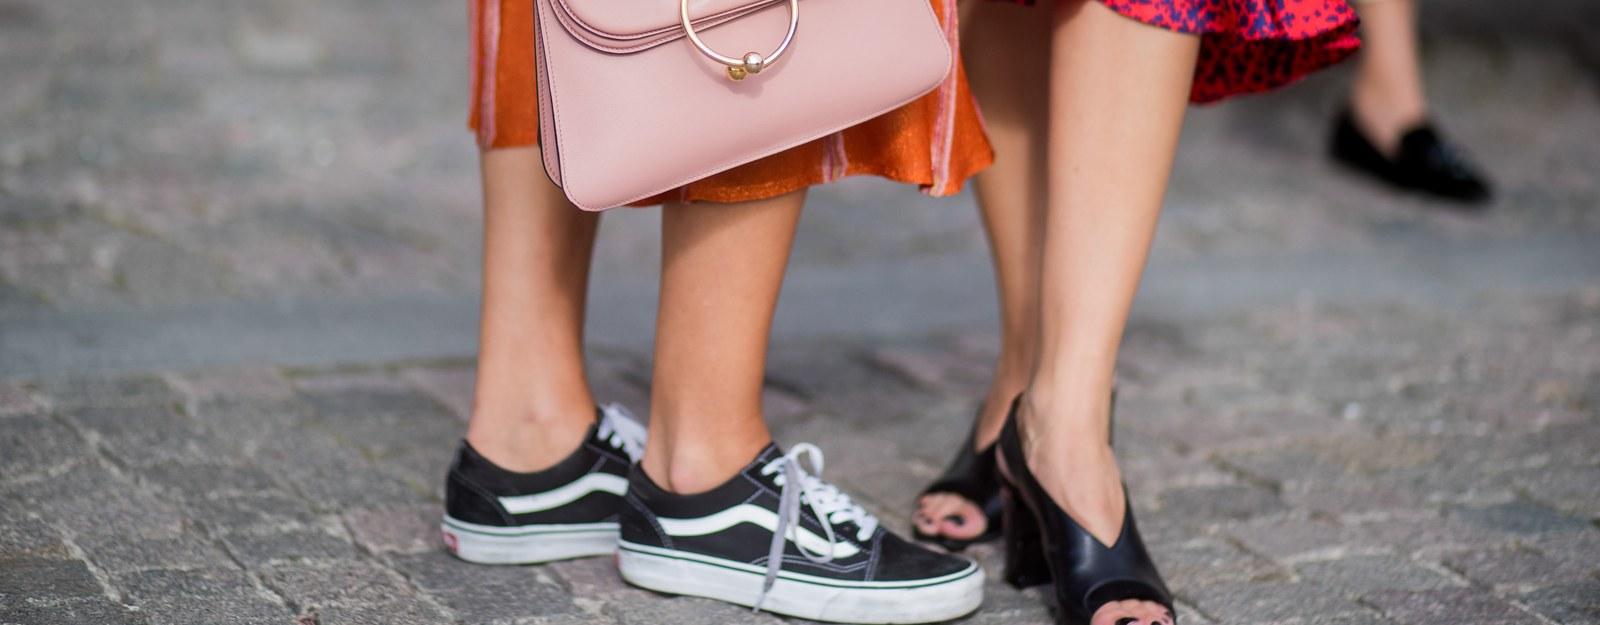 Come vestirsi bene in estate: 5 outfit gonna lunga +